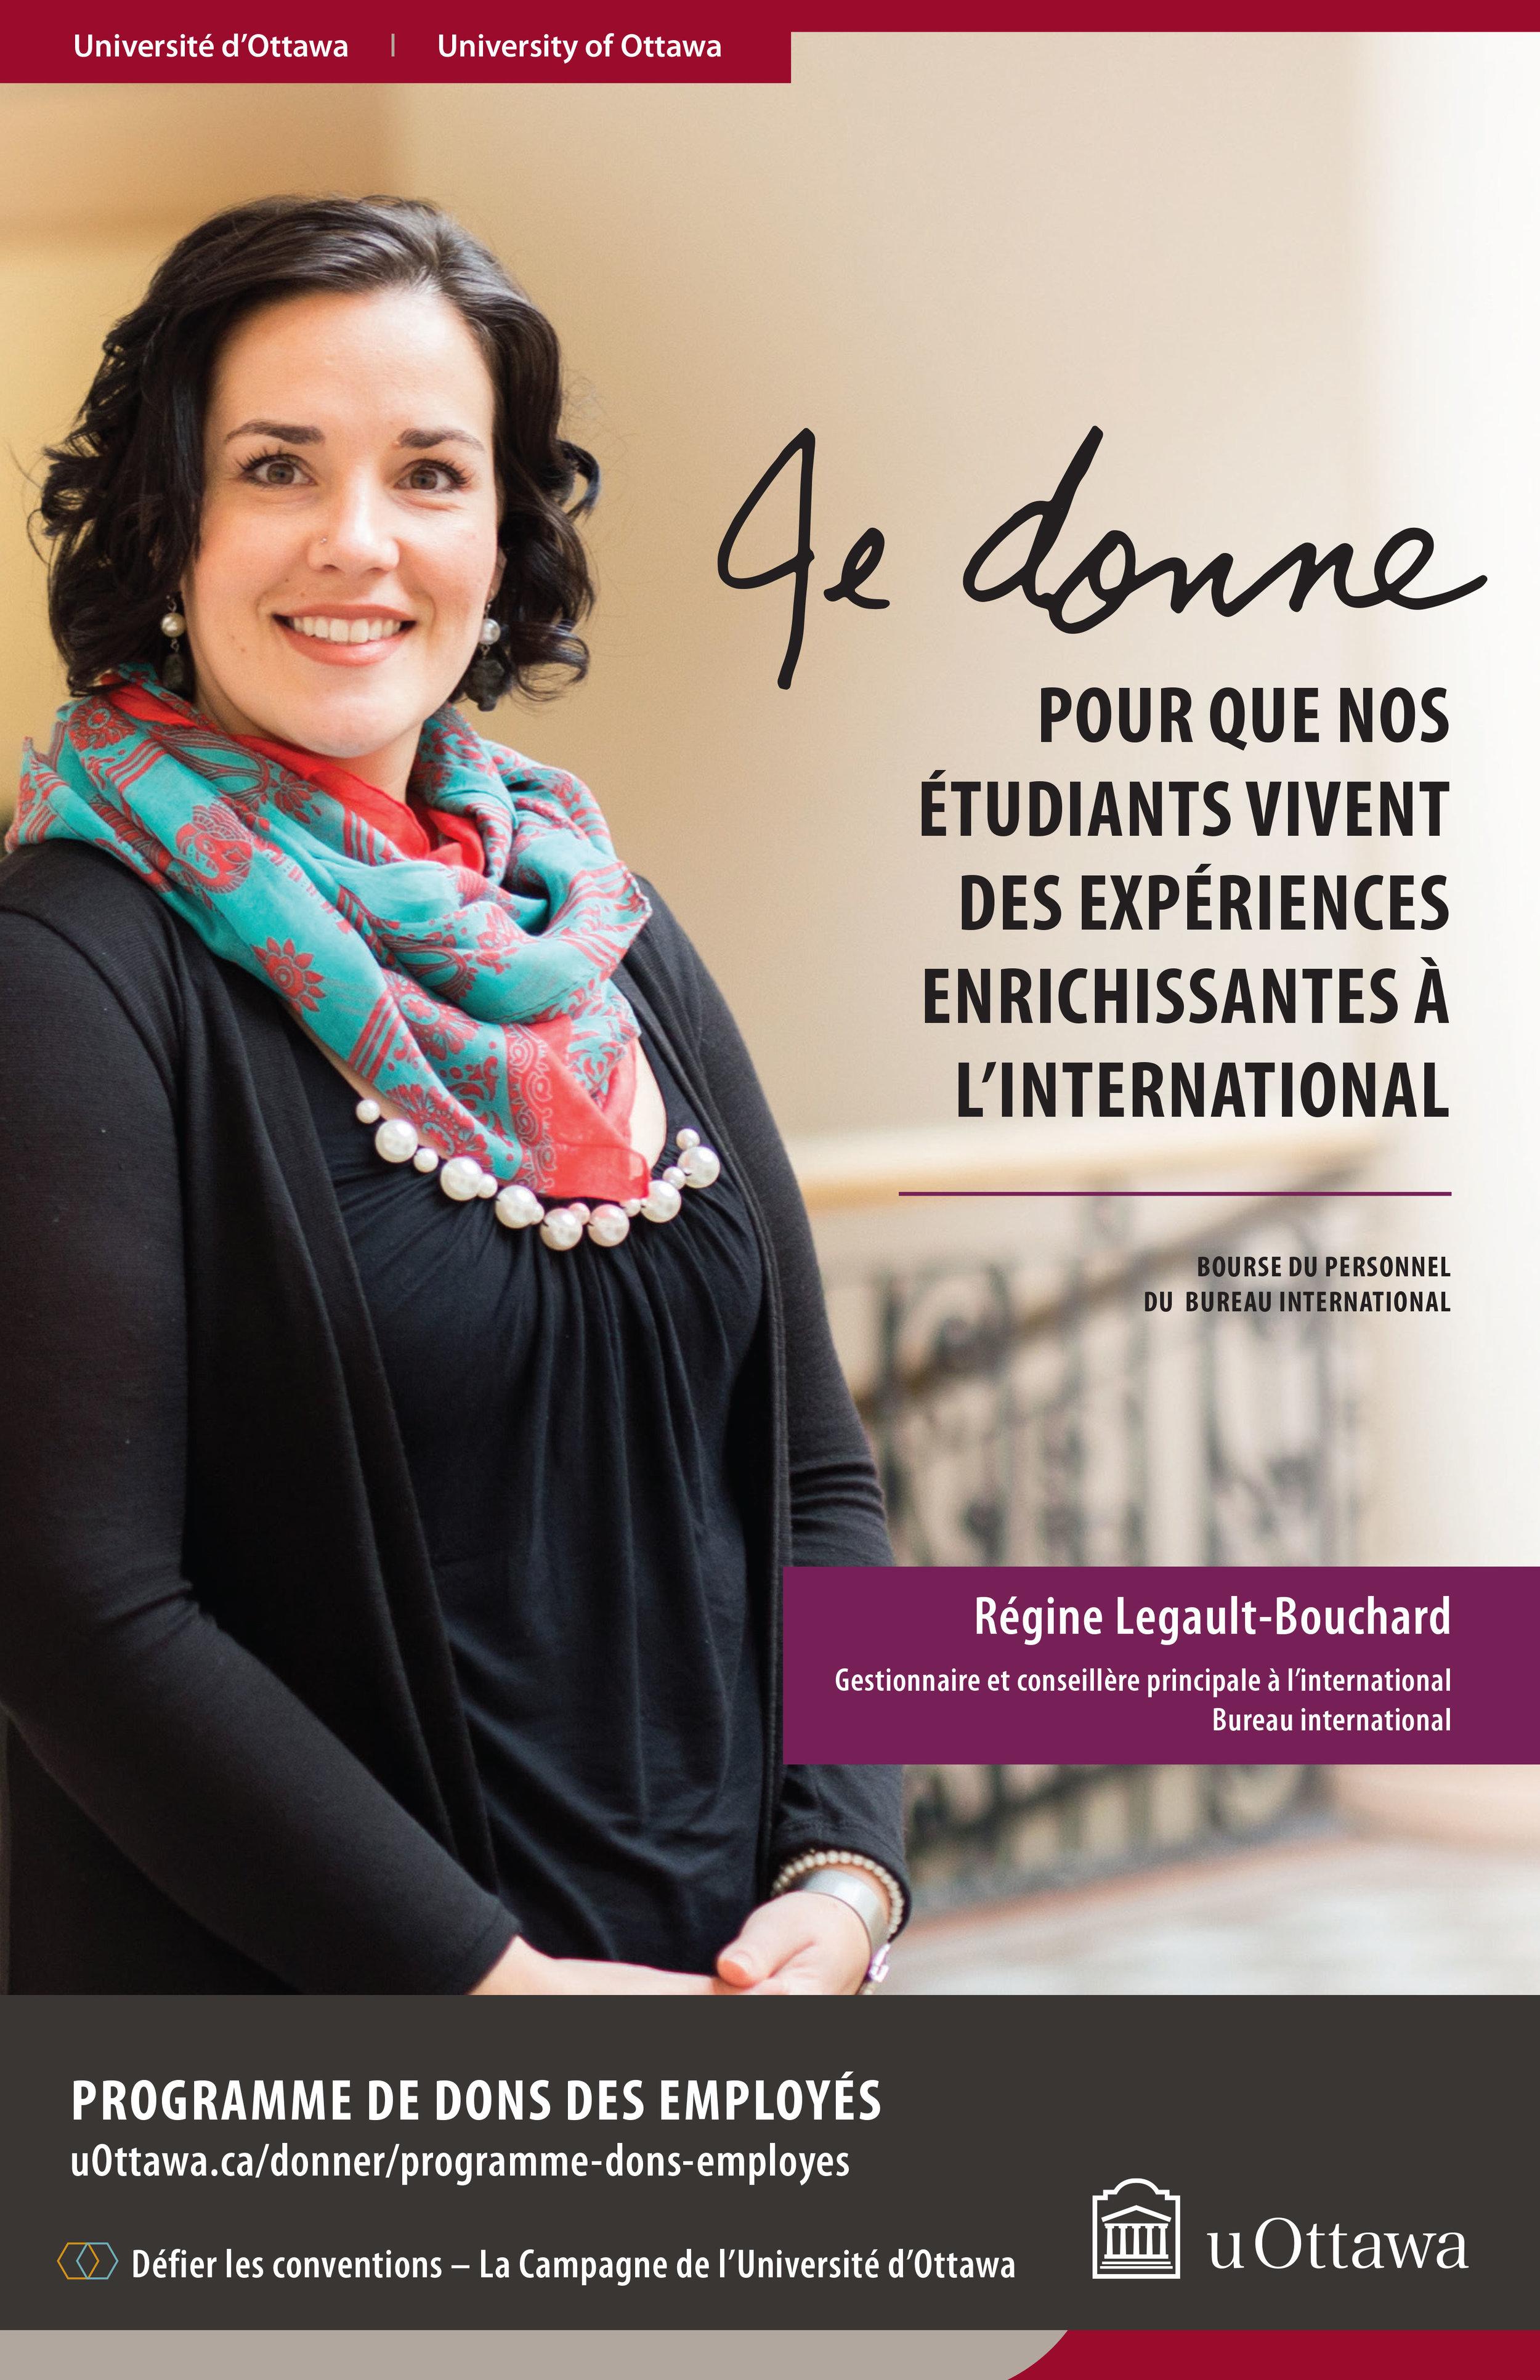 DEVT15_252_EmployeeGiving2016_Posters_FR_FINAL_PRINT_nocrop_Regine.jpg